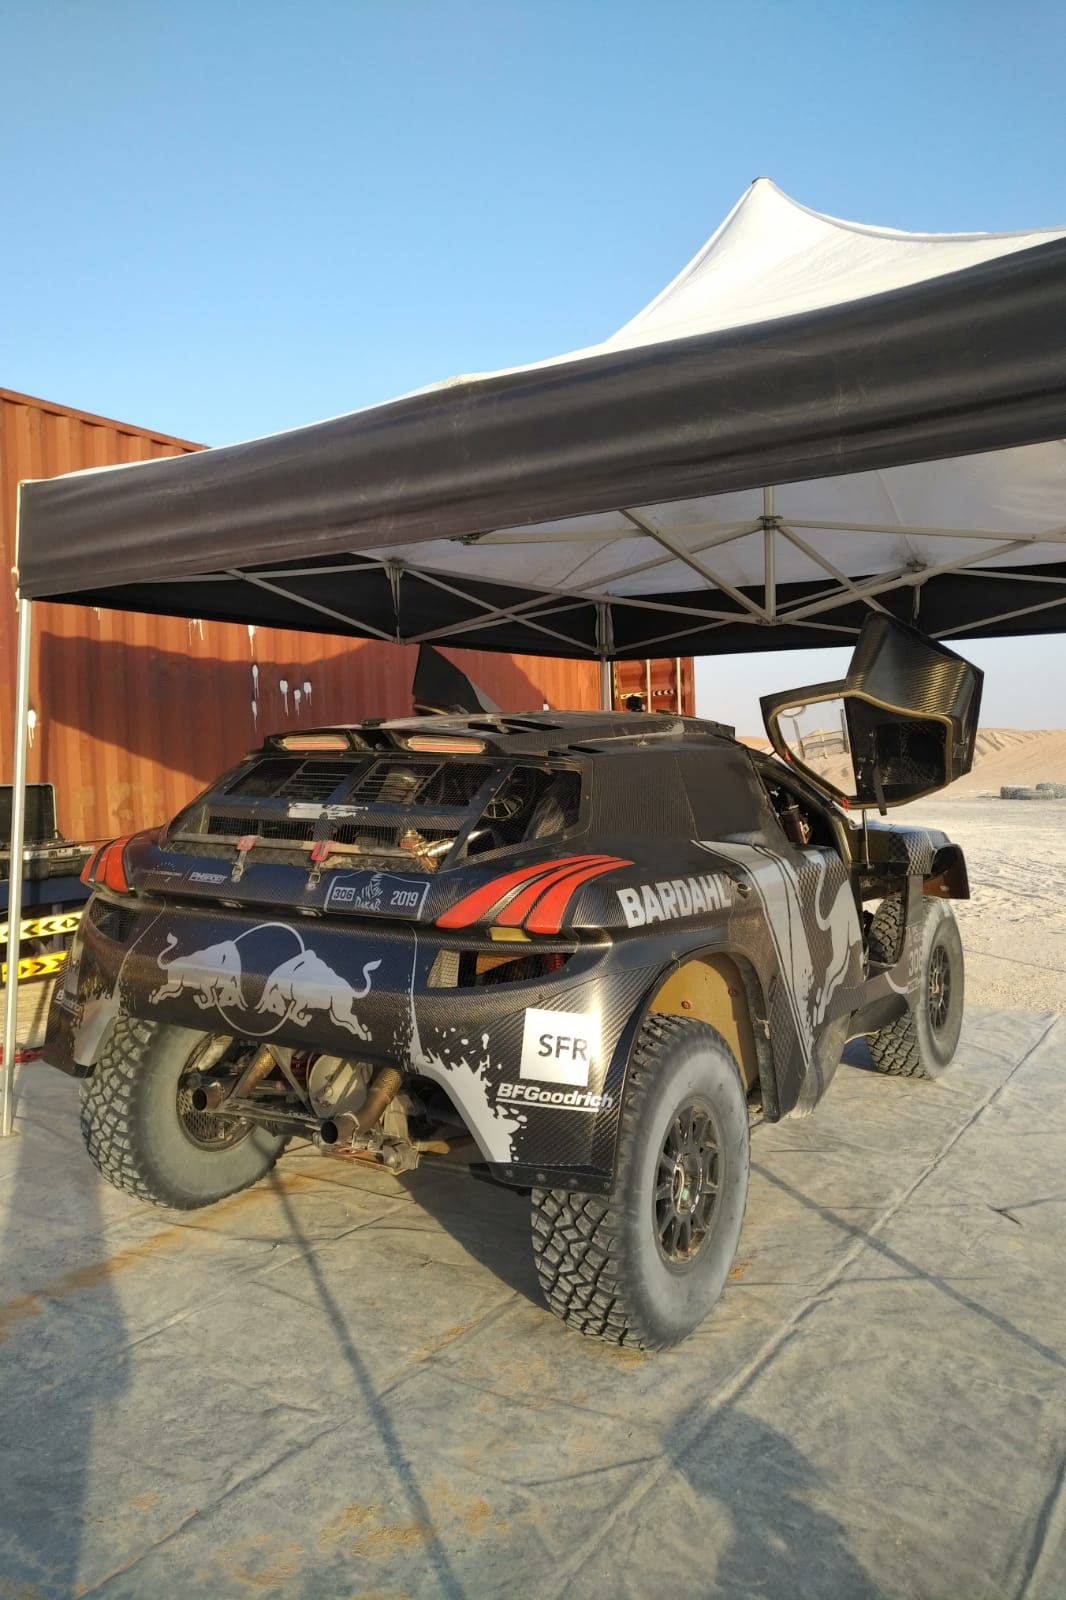 2019 41º Rallye Raid Dakar - Perú [6-17 Enero] - Página 2 DuJgT2fW0Ac63P6